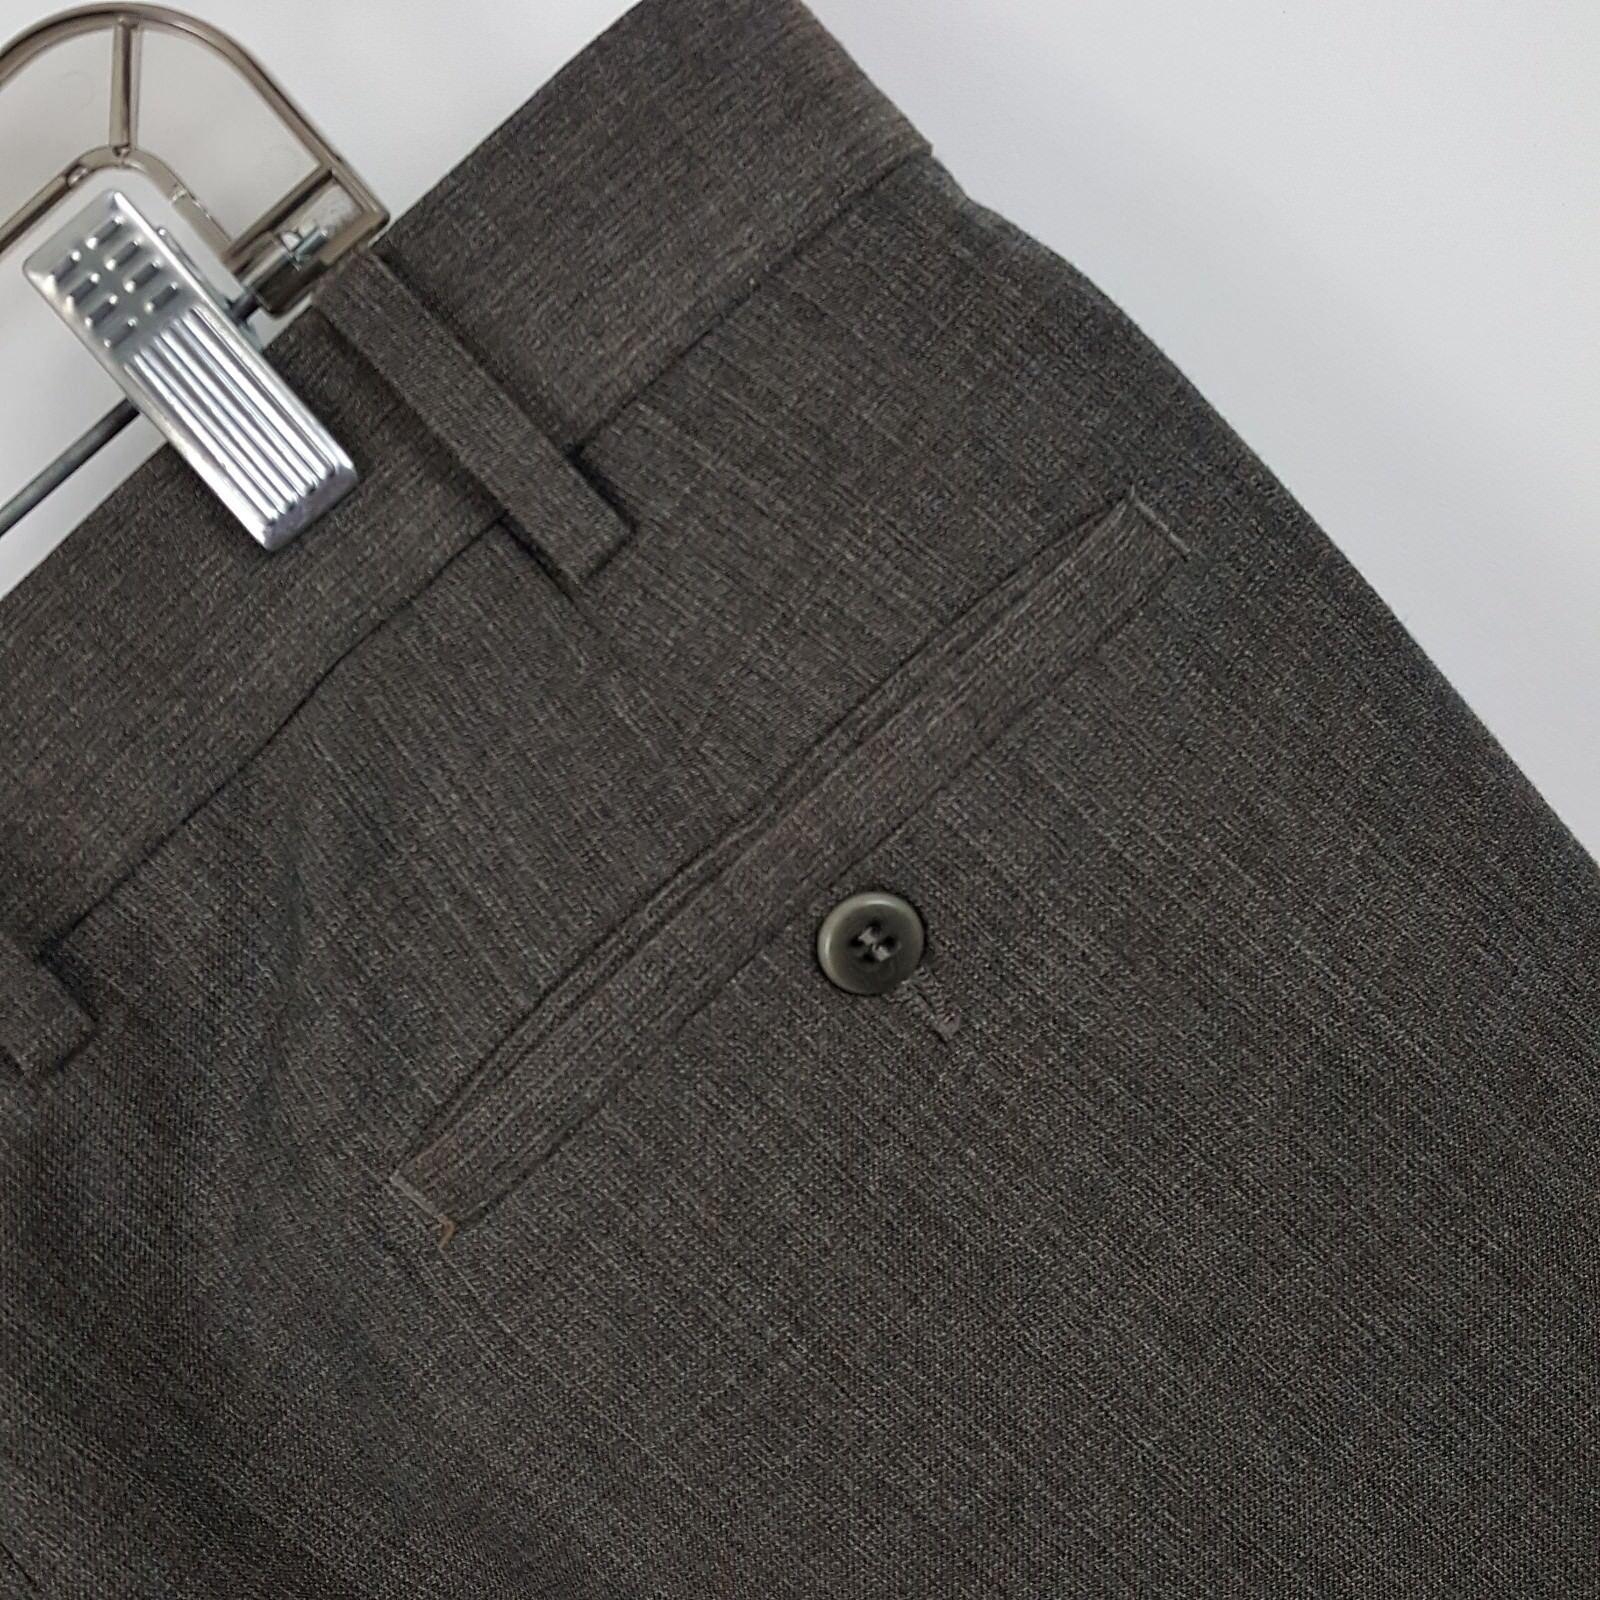 Zanella Bob Brown Pleated Wool  Men's Dress Pants Size 36 x 27